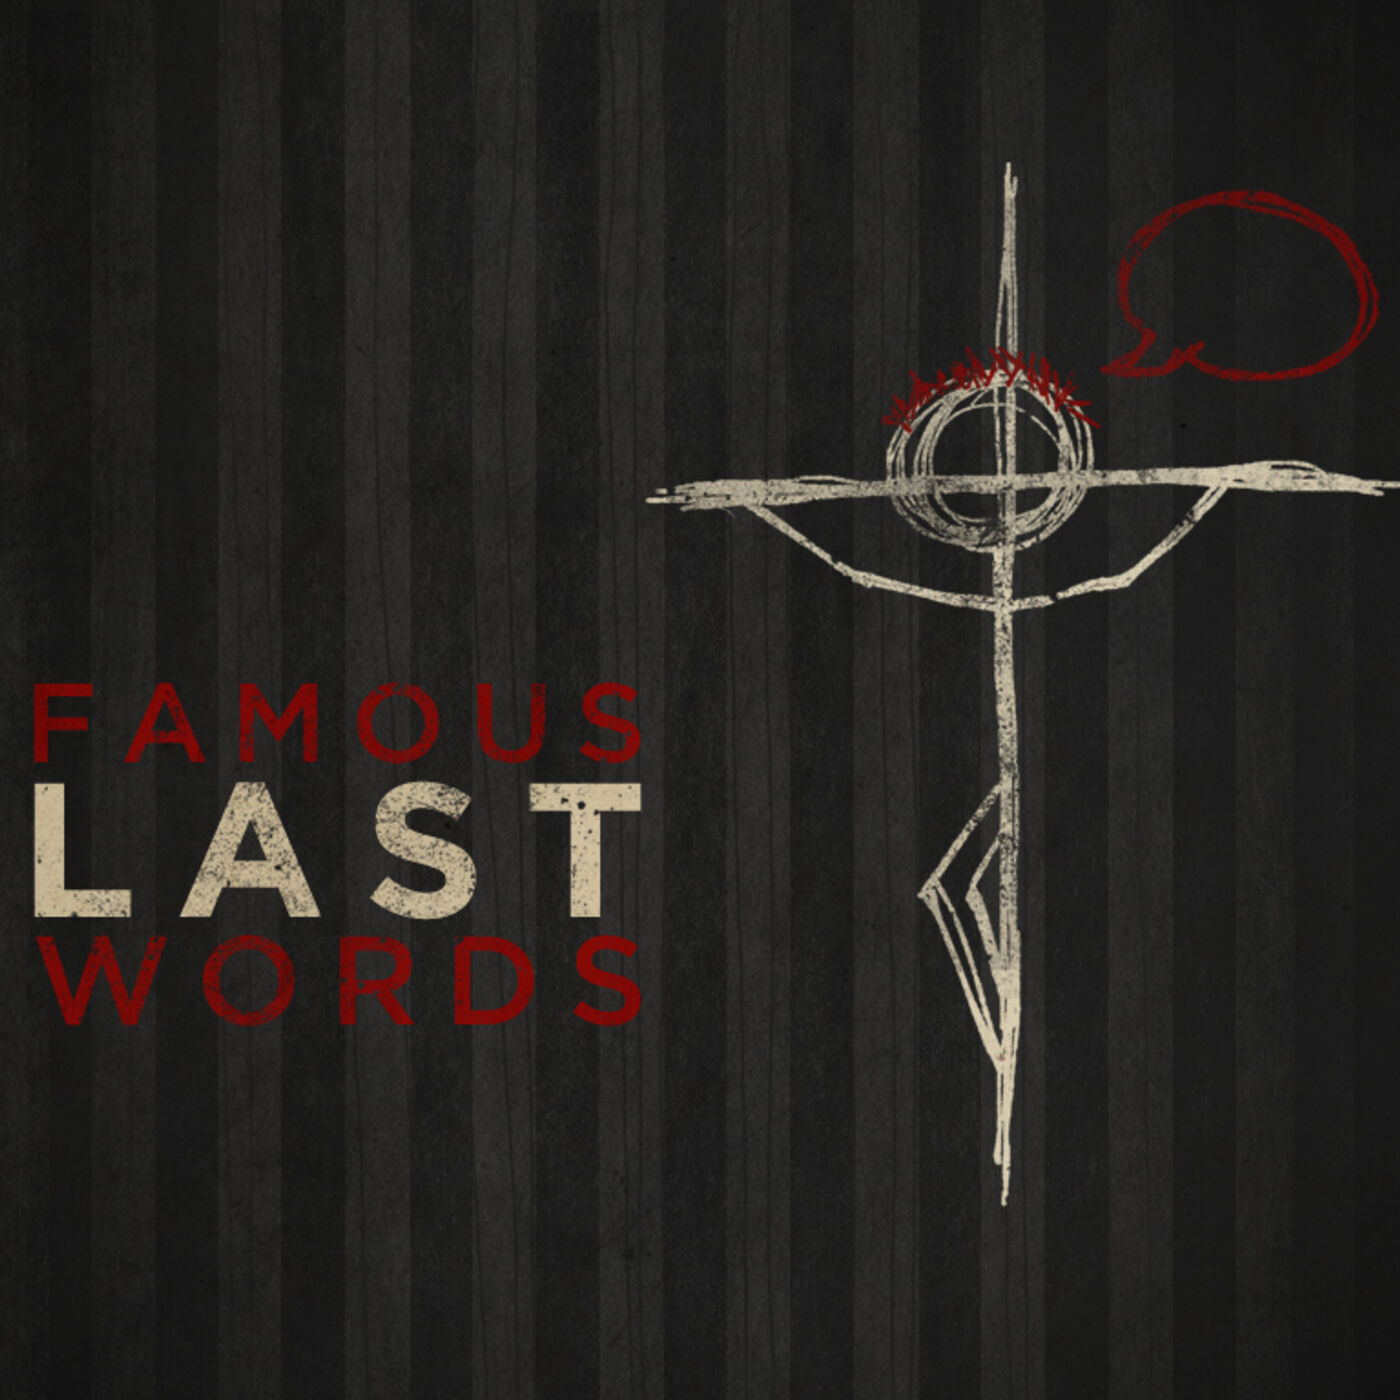 Famous Last Words - Week 4